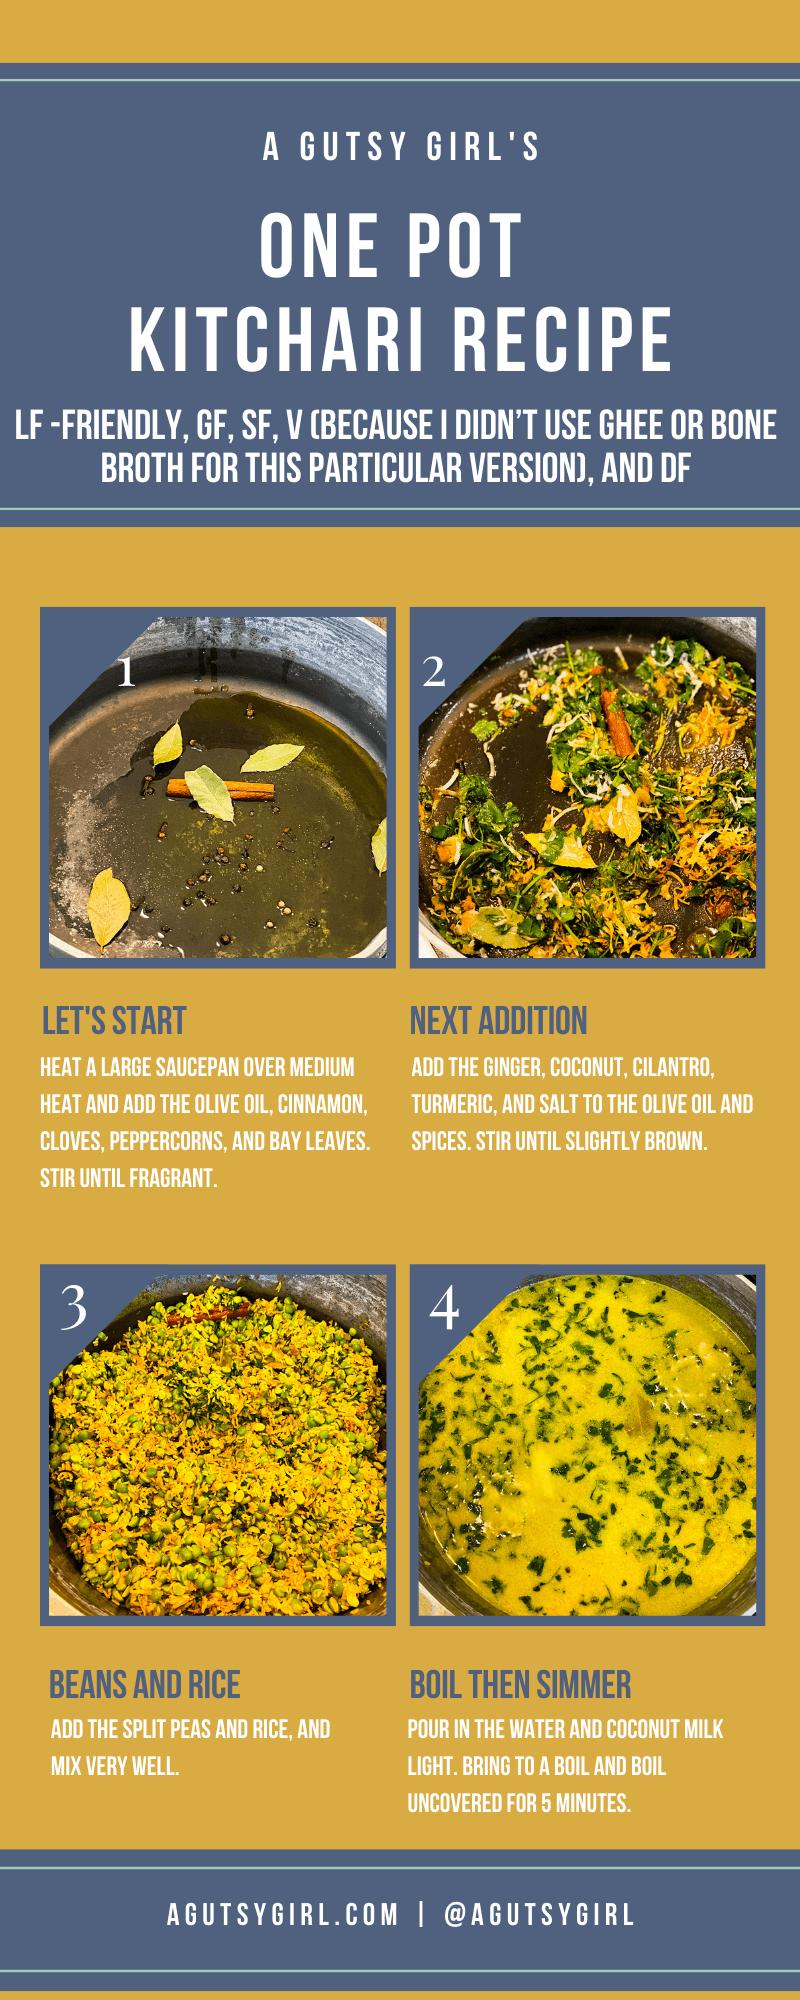 One Pot Kitchari Recipe agutsygirl.com #kitchari #kitcharicleanse #onepotmeals #glutenfreerecipes instructions